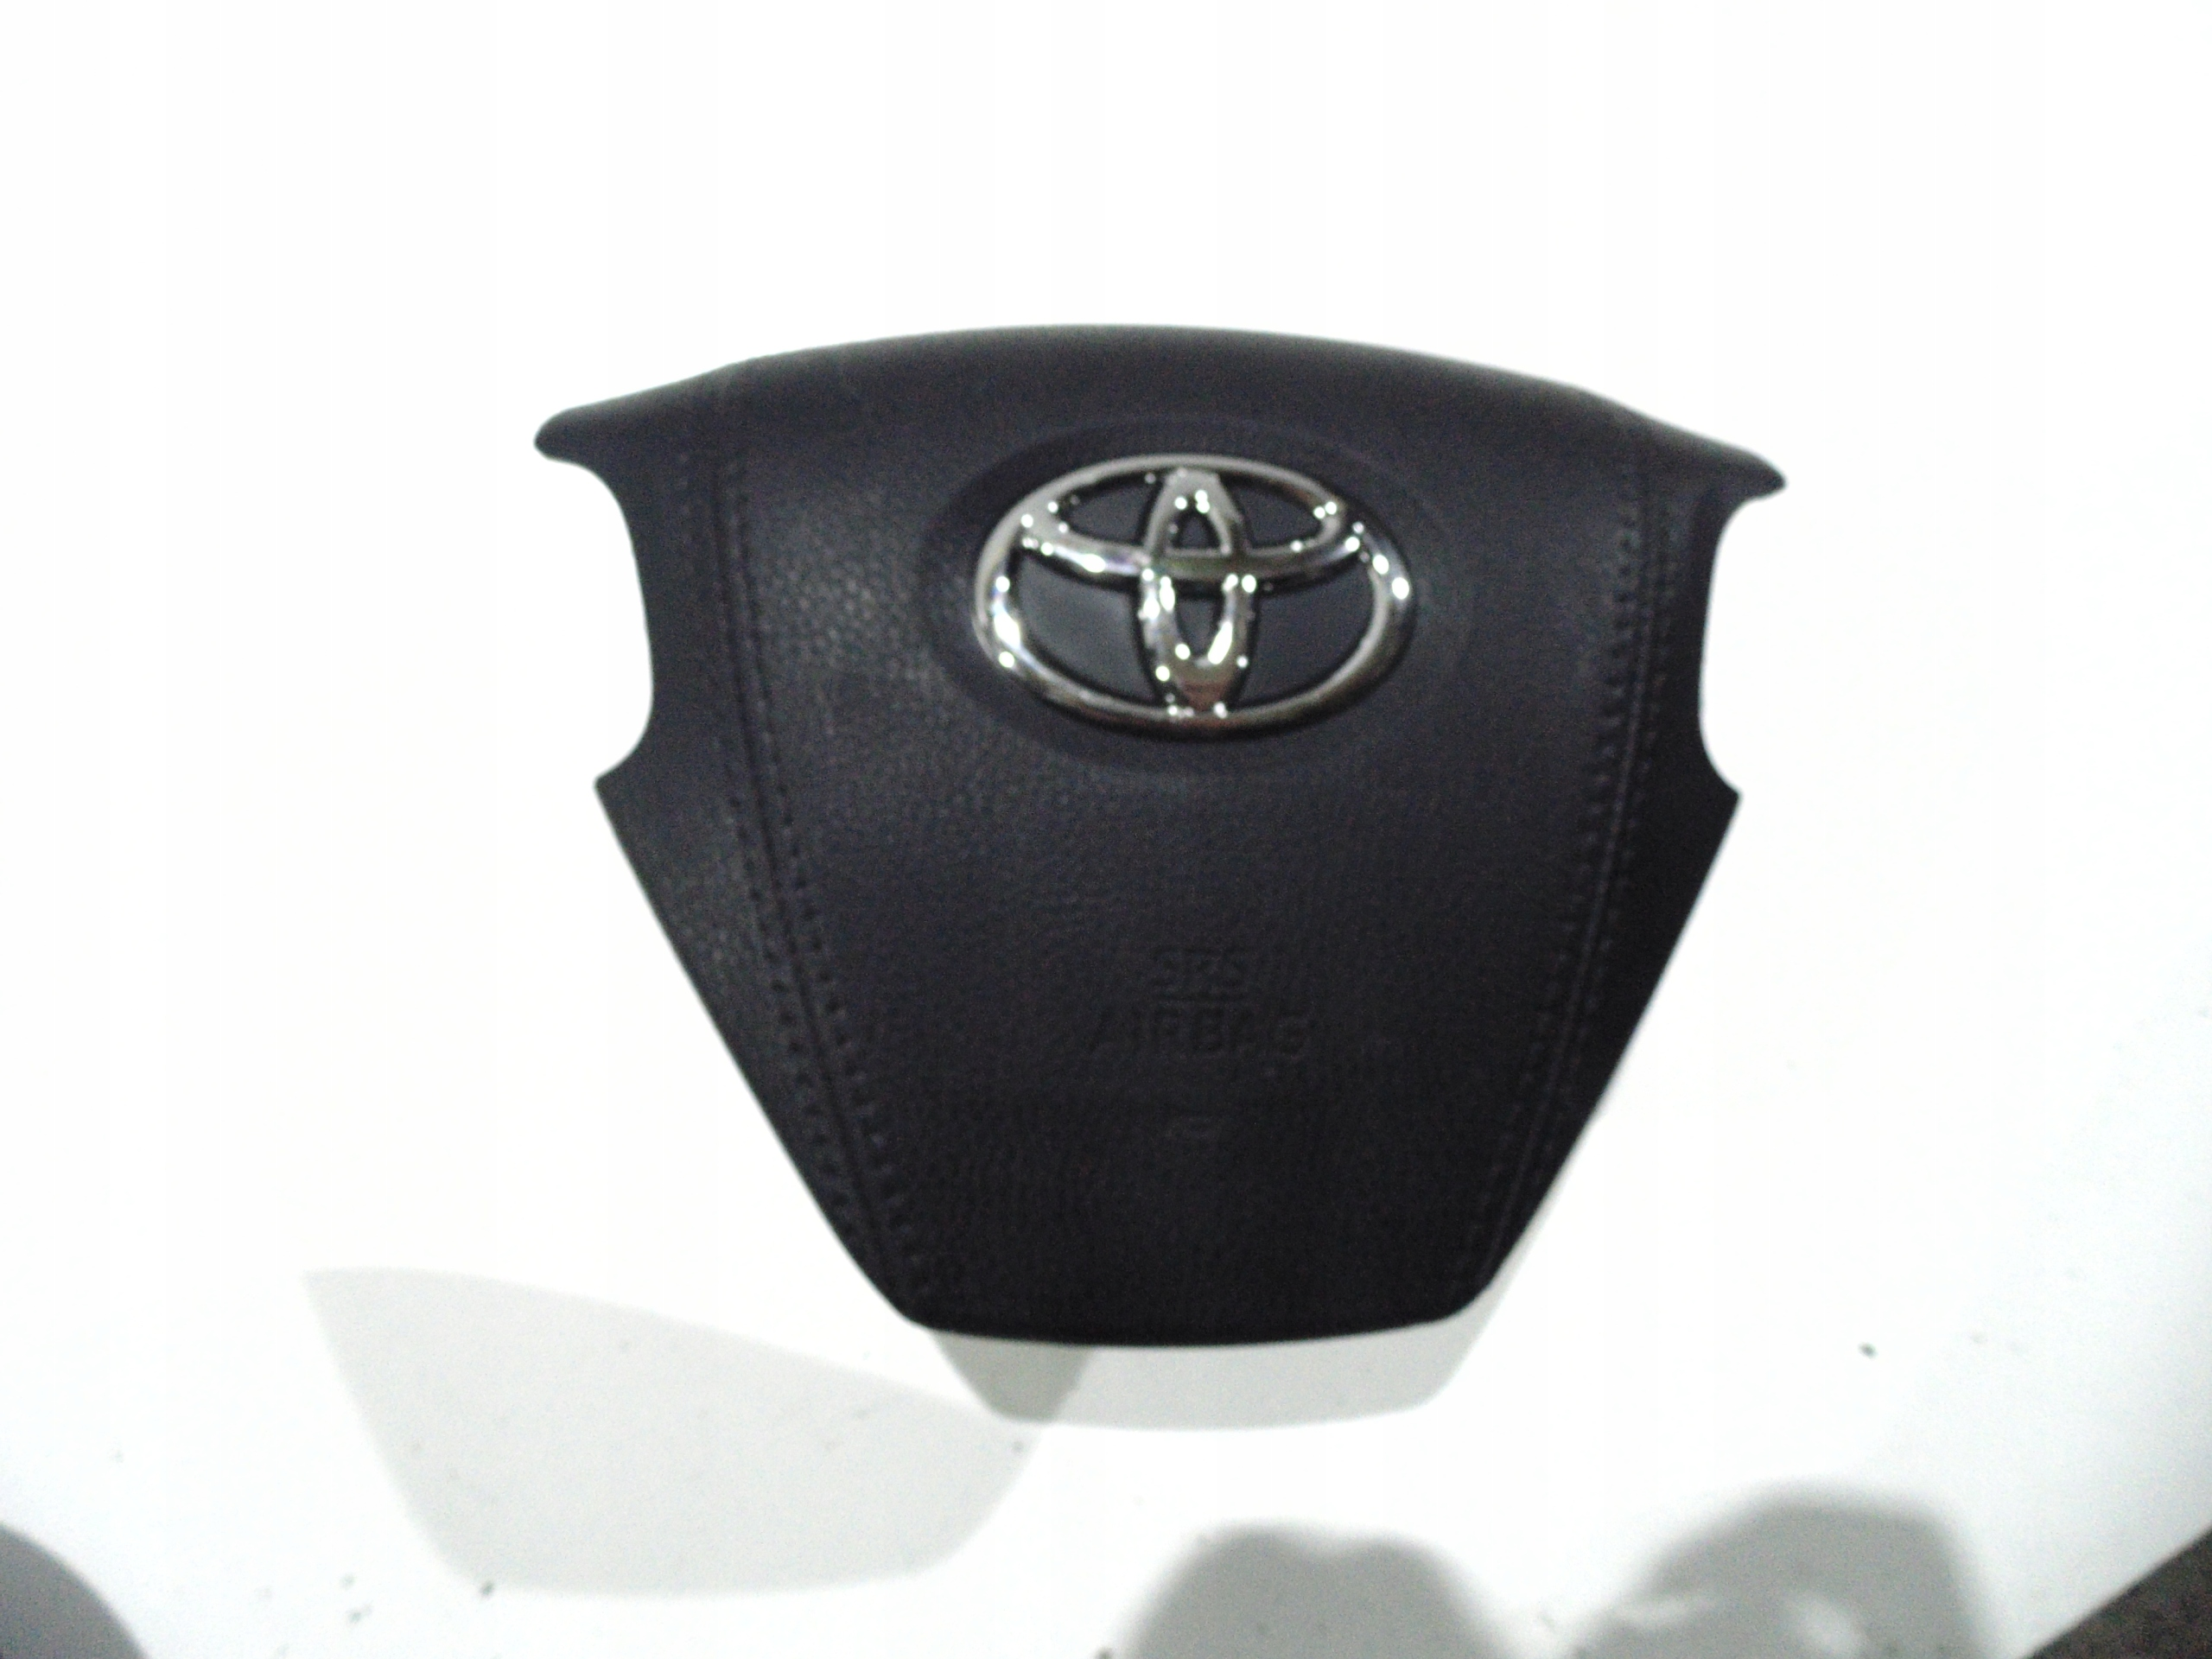 Toyota Sequoia 4 Runnercamry Airbag Kierowcy 7684935847